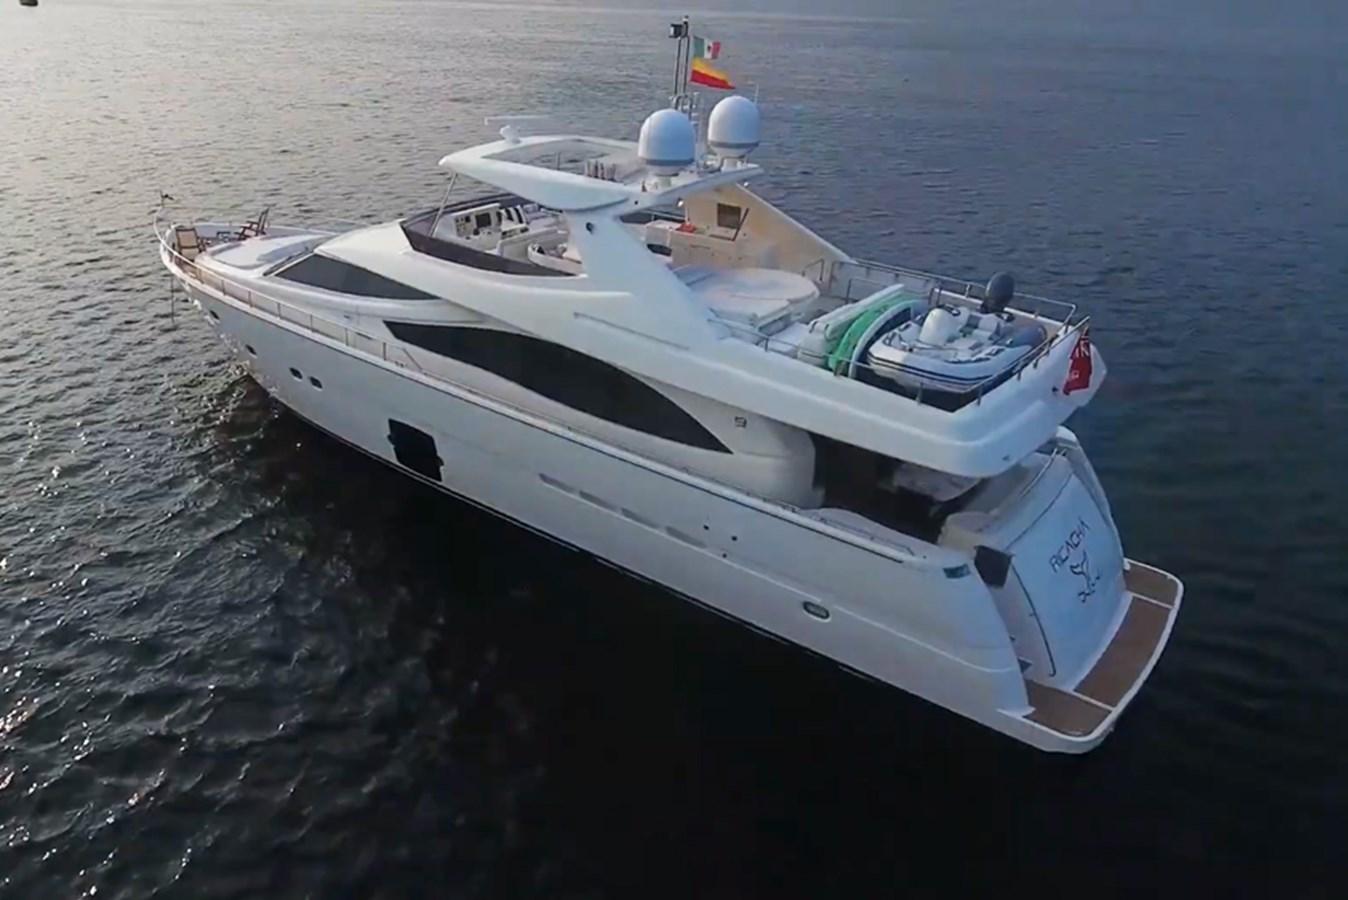 RICACHA 2012 Ferretti 830 @ Acapulco yacht for sale